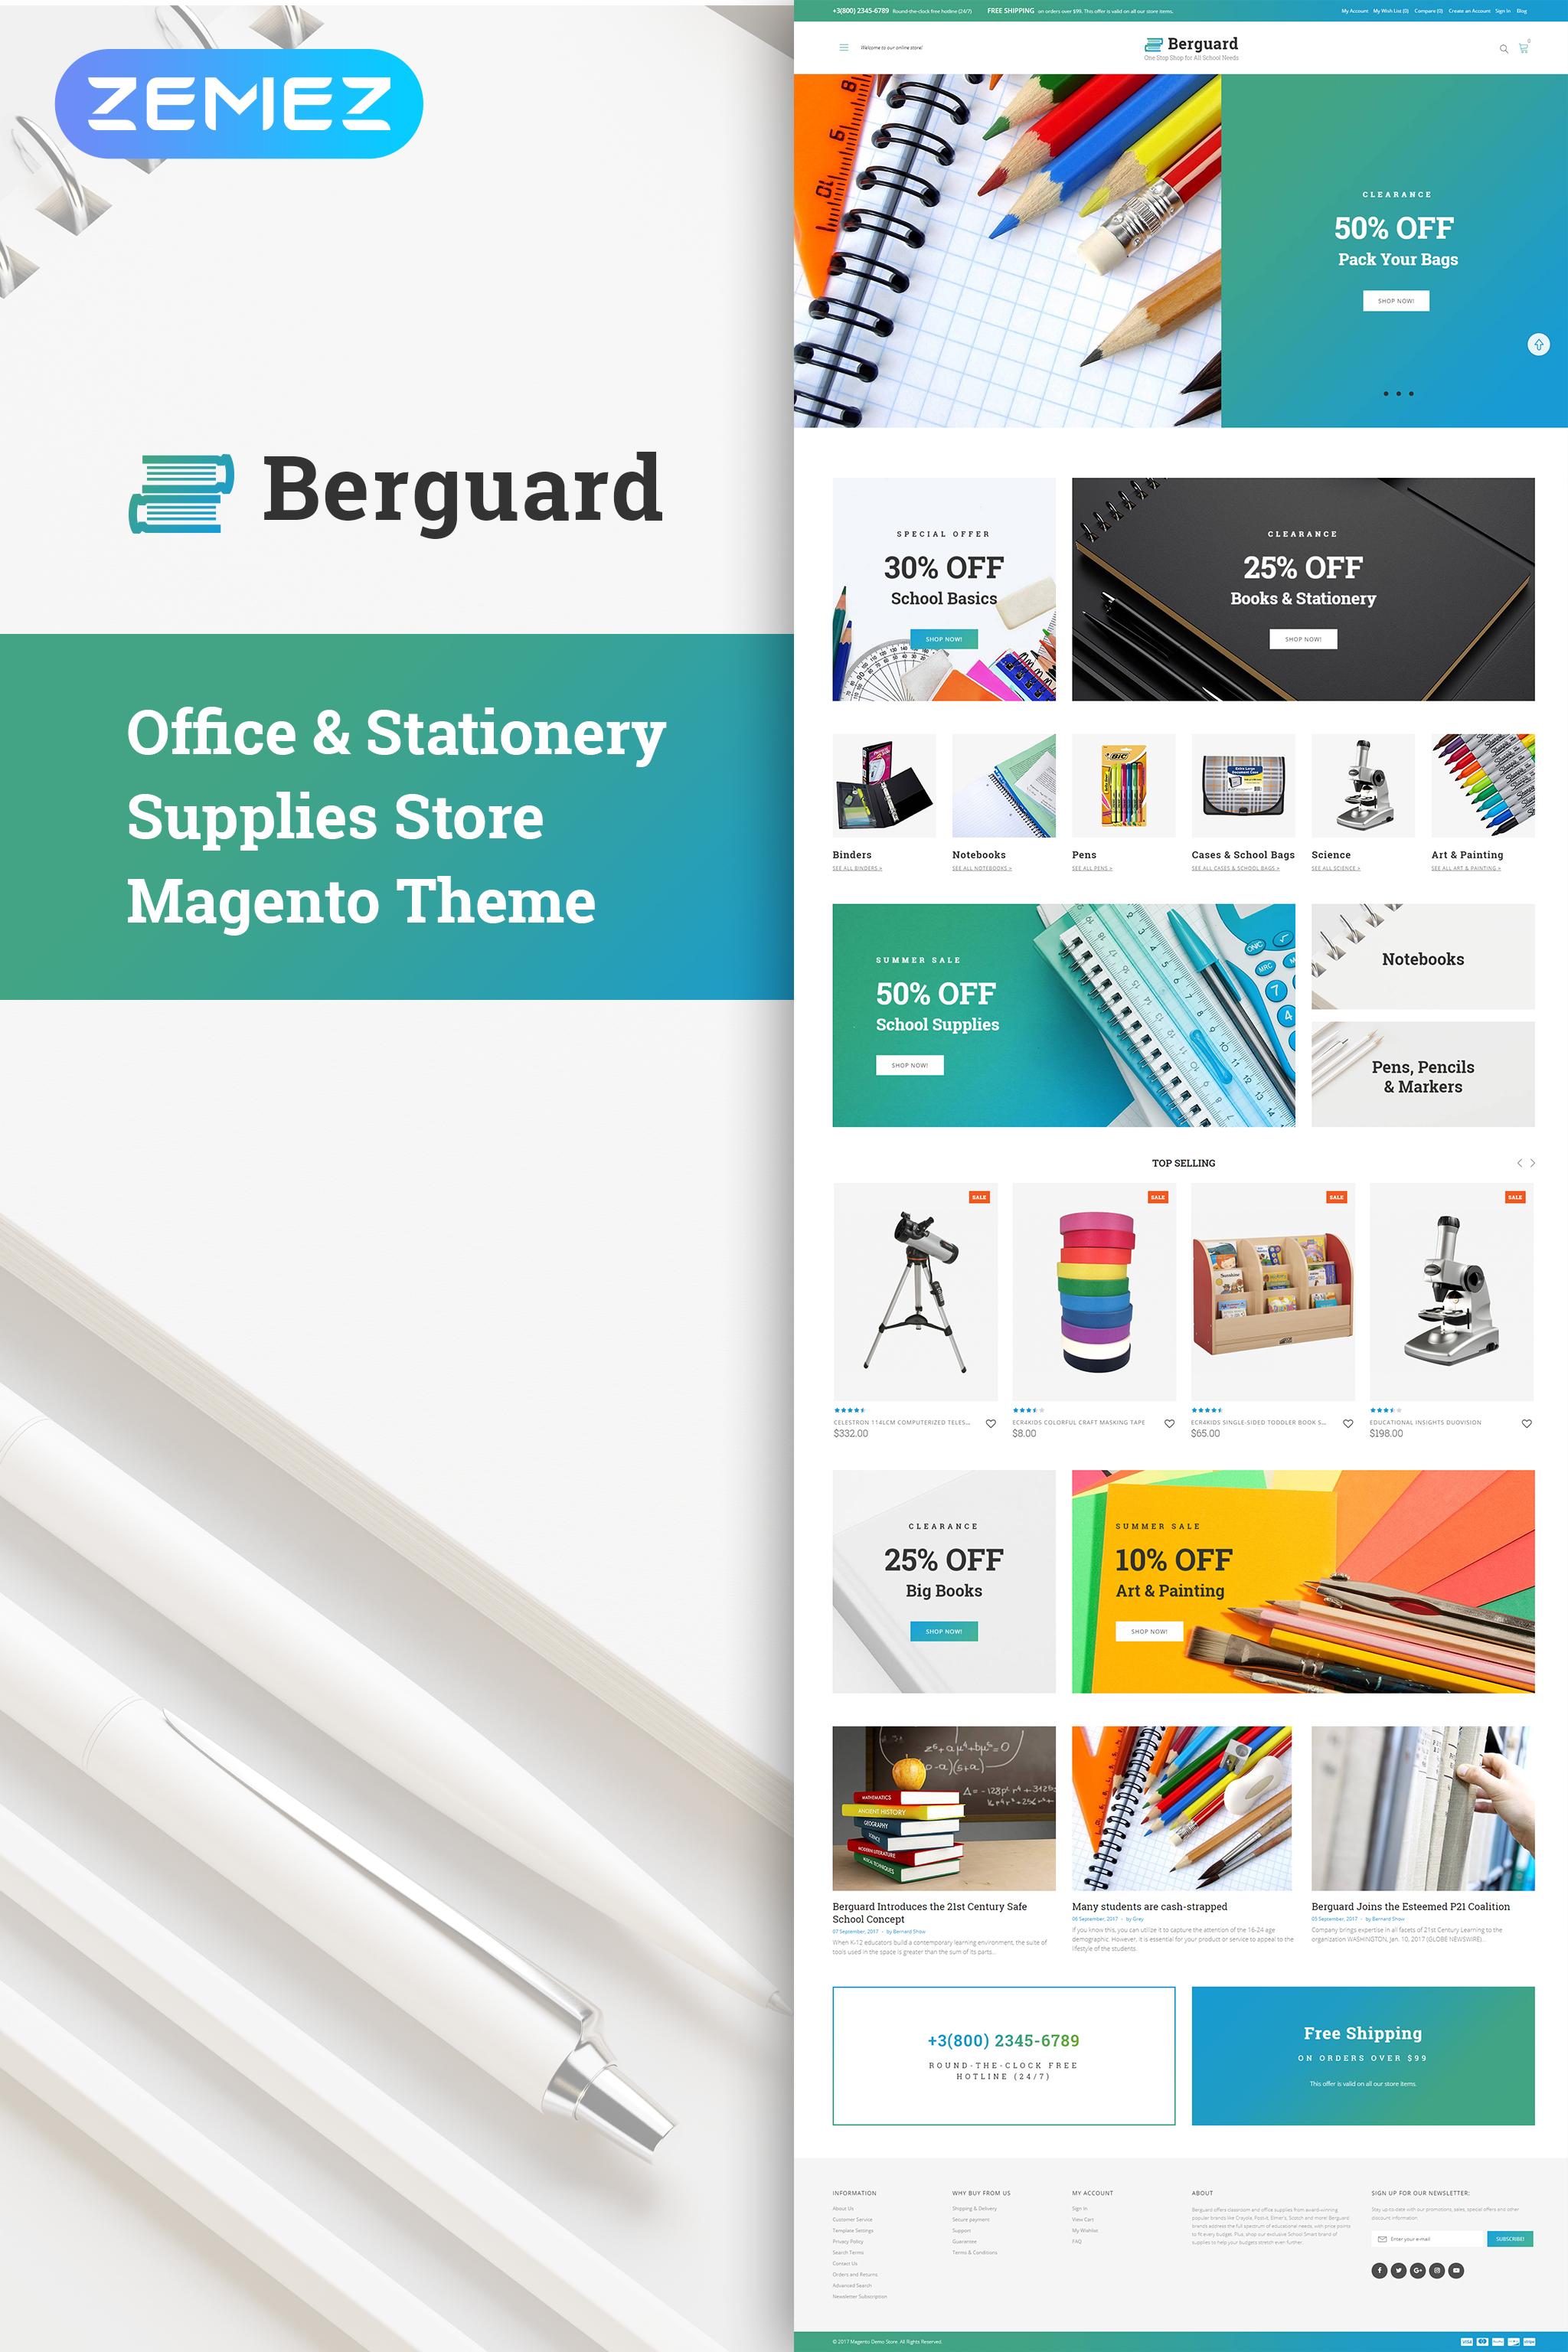 """Berguard - Office & Stationery Supplies"" Magento模板 #64137"